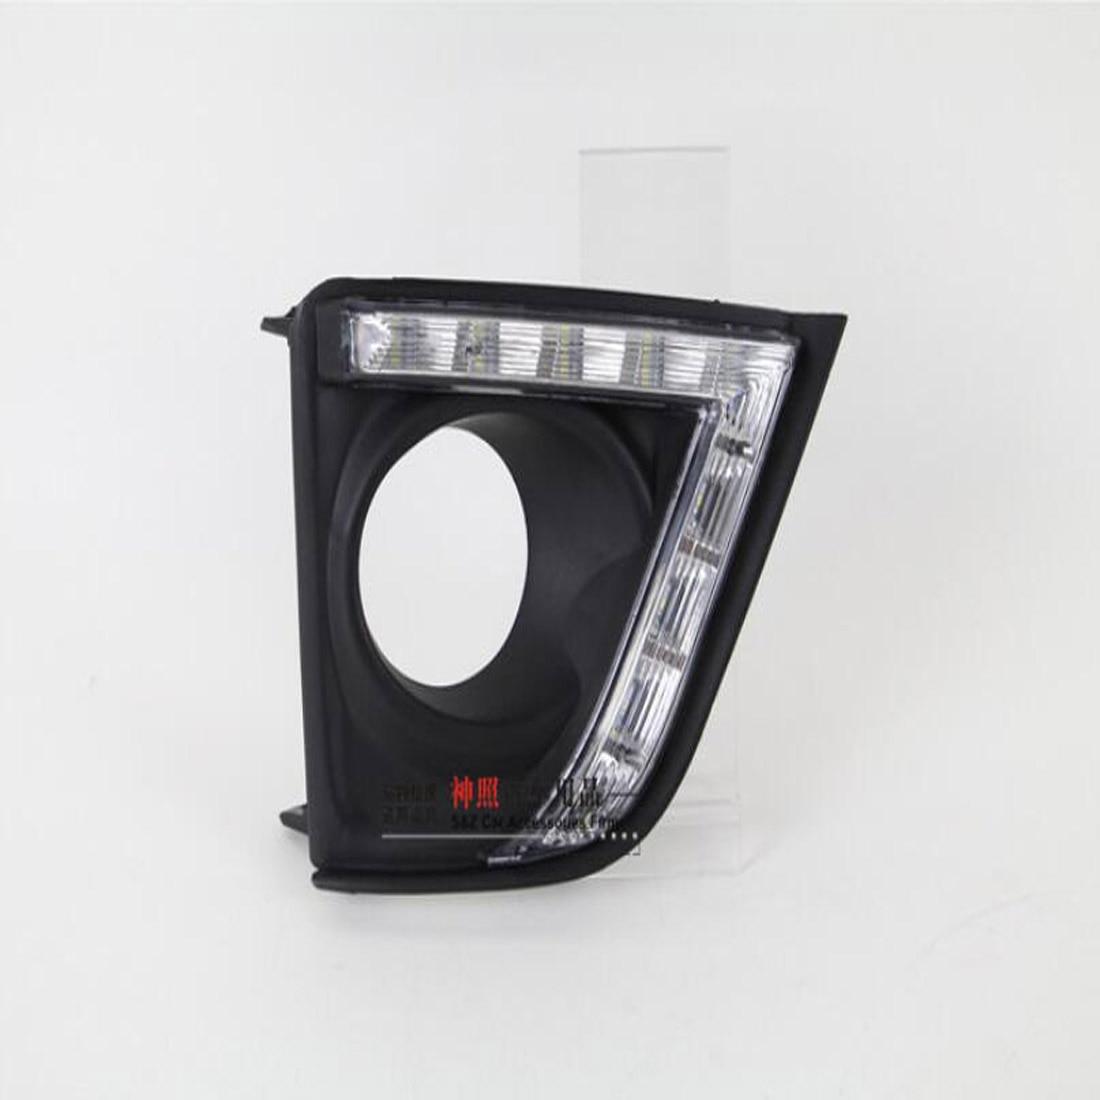 Dongzhen Auto For Toyota Corolla 2011-2014 Car Daytime Running Light DRL LED Turn Signal Light Highlight Fog Lamp Modified 2pcs